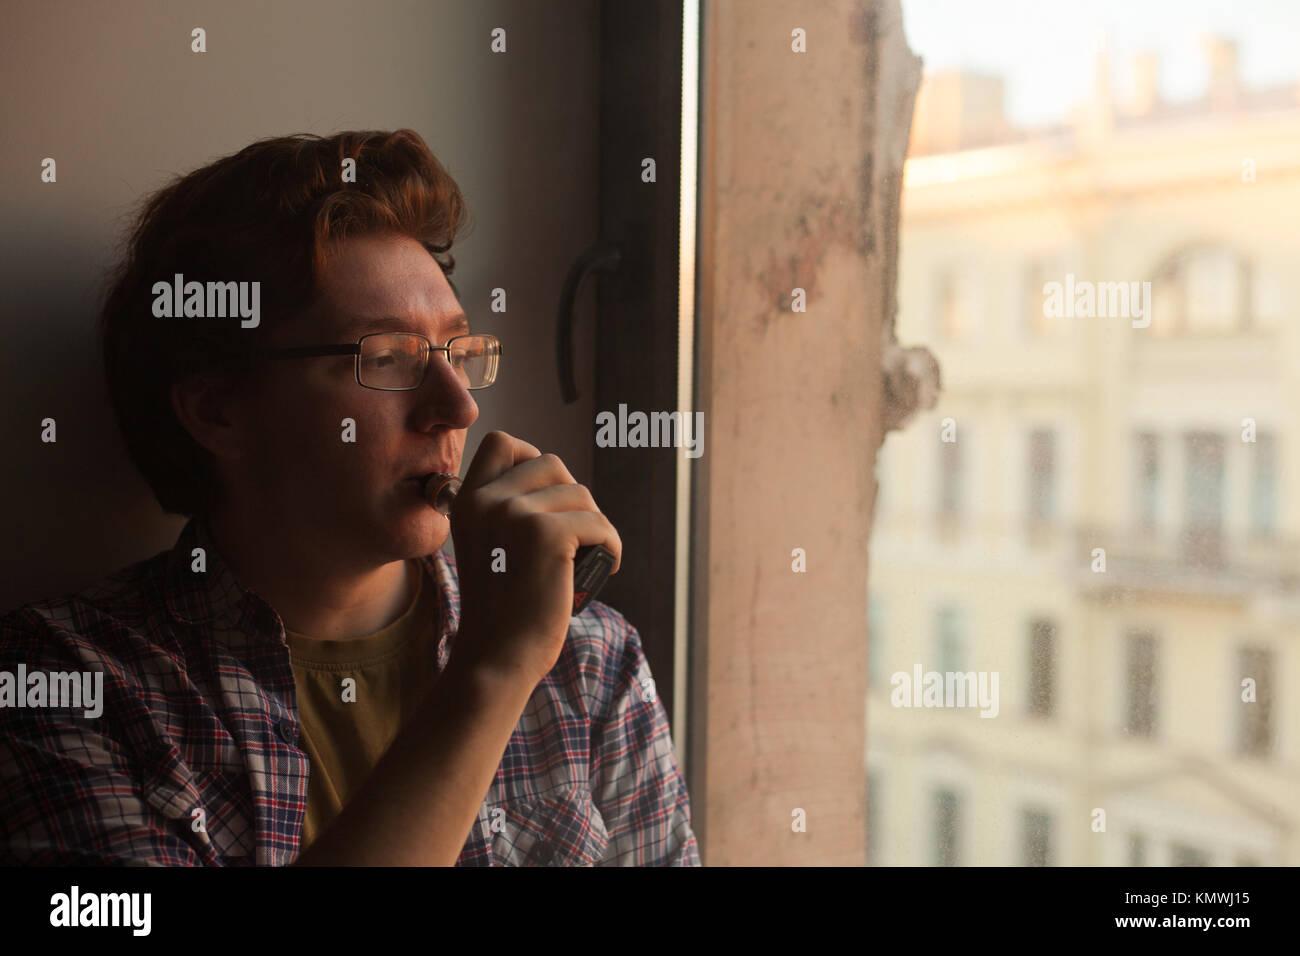 Young man smoking electronic cigarette near window. vaping. - Stock Image